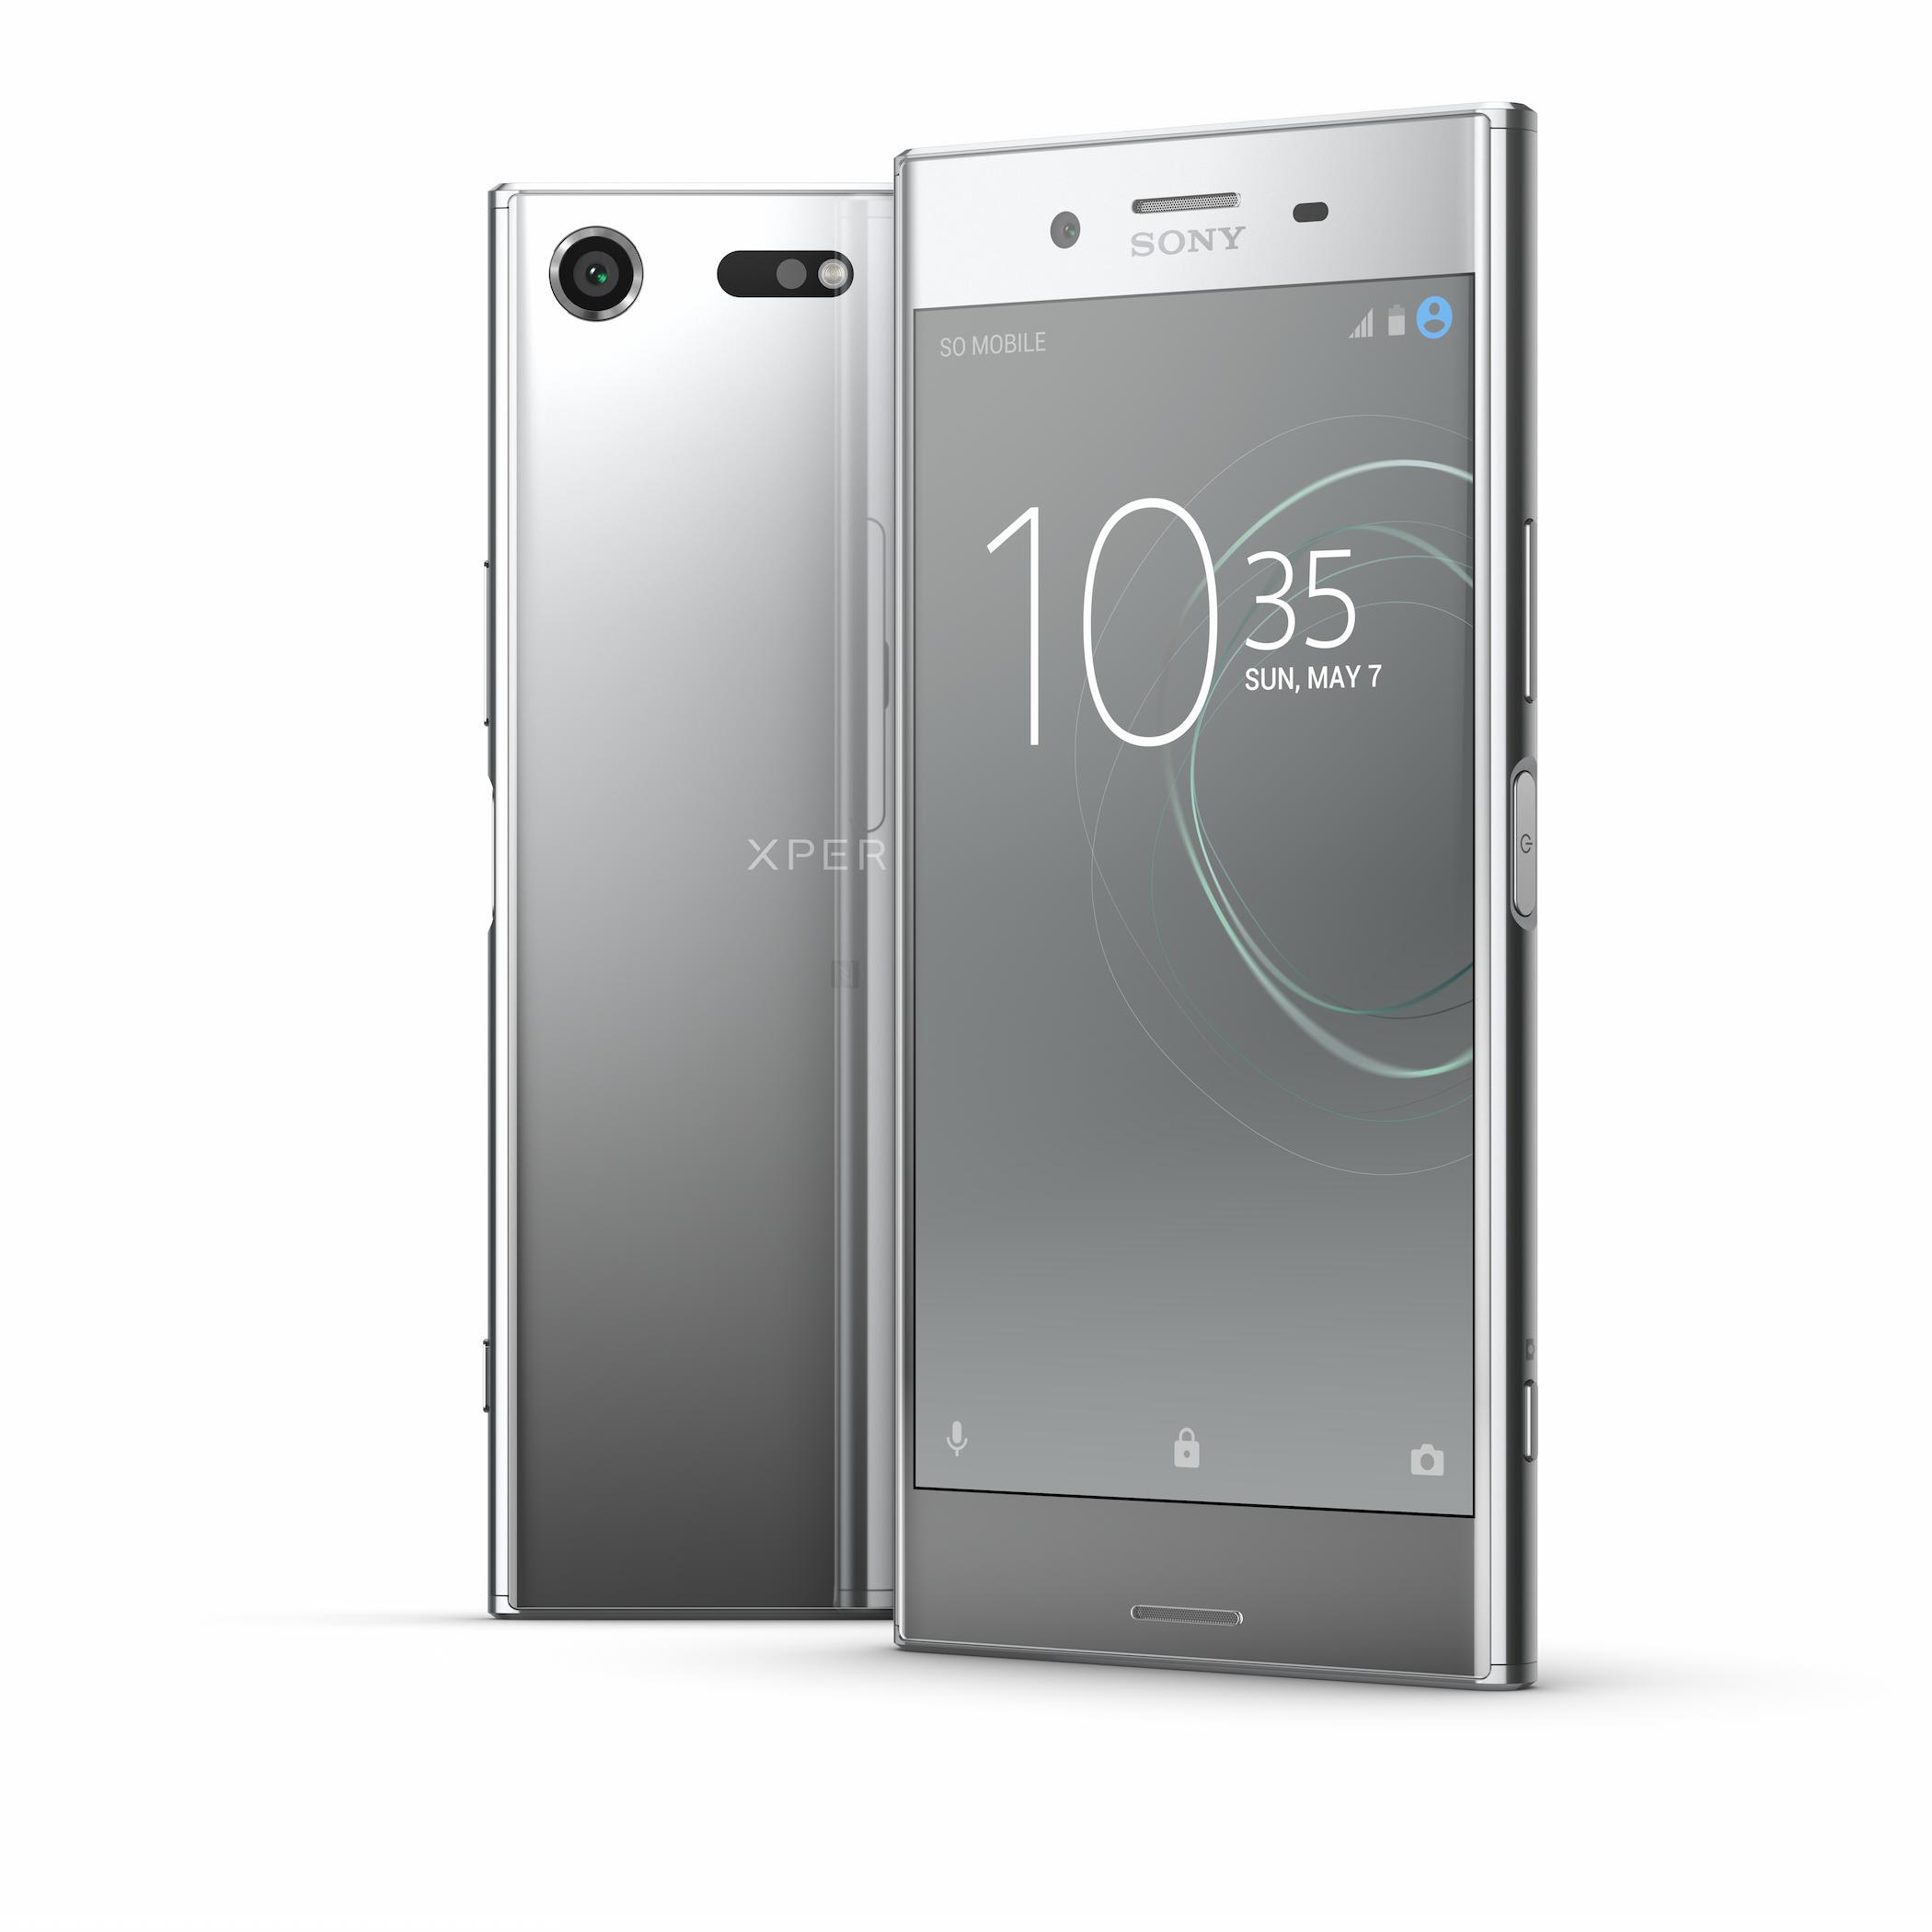 Sony Xperia XZ Premium、XZs升級亮相!導入4K HDR顯示、超慢動作攝影